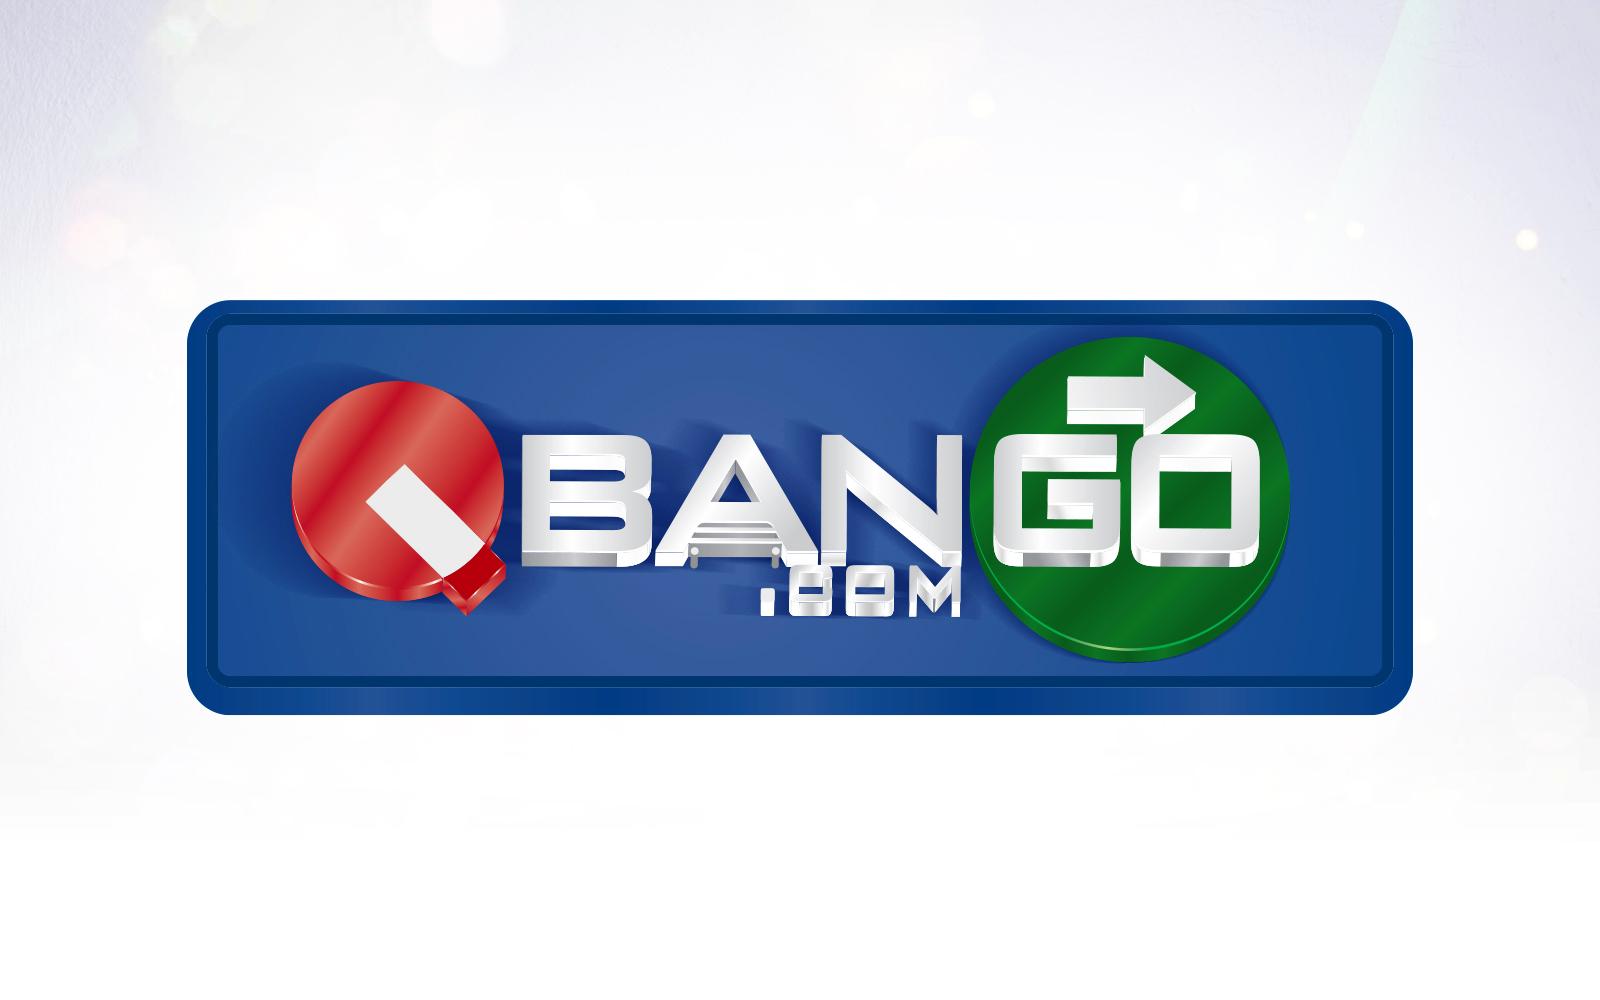 QBango 3D Logo Design